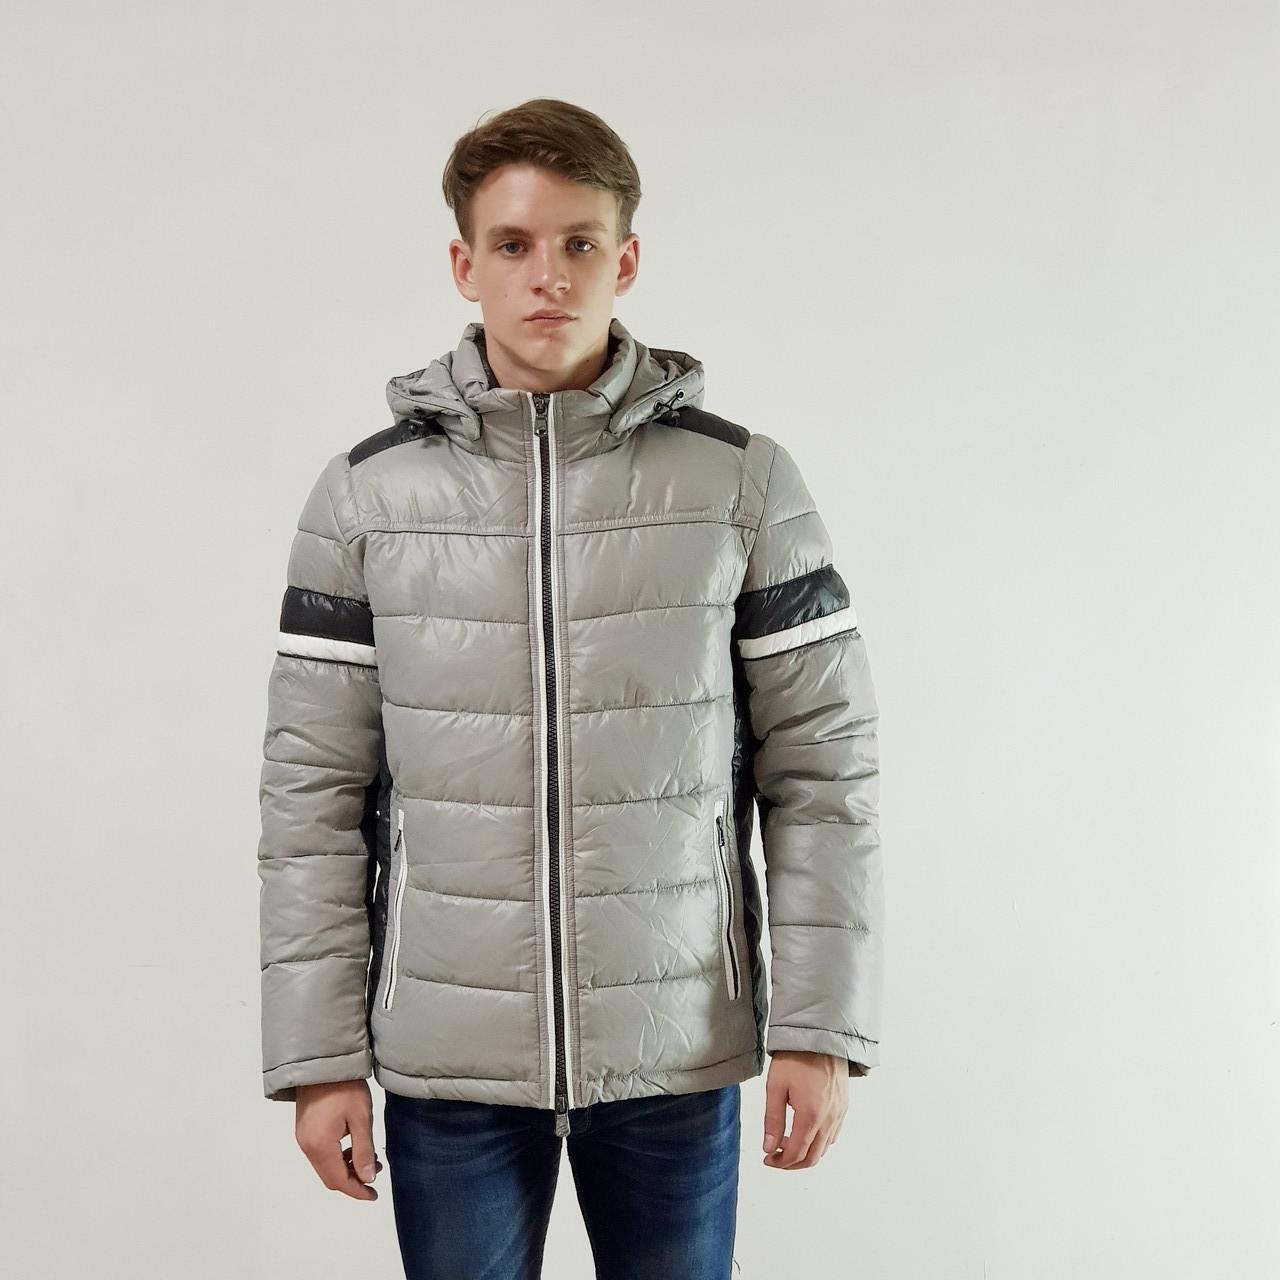 Куртка мужская зимняя Snowimage с капюшоном 52 светло-серый 132-9354